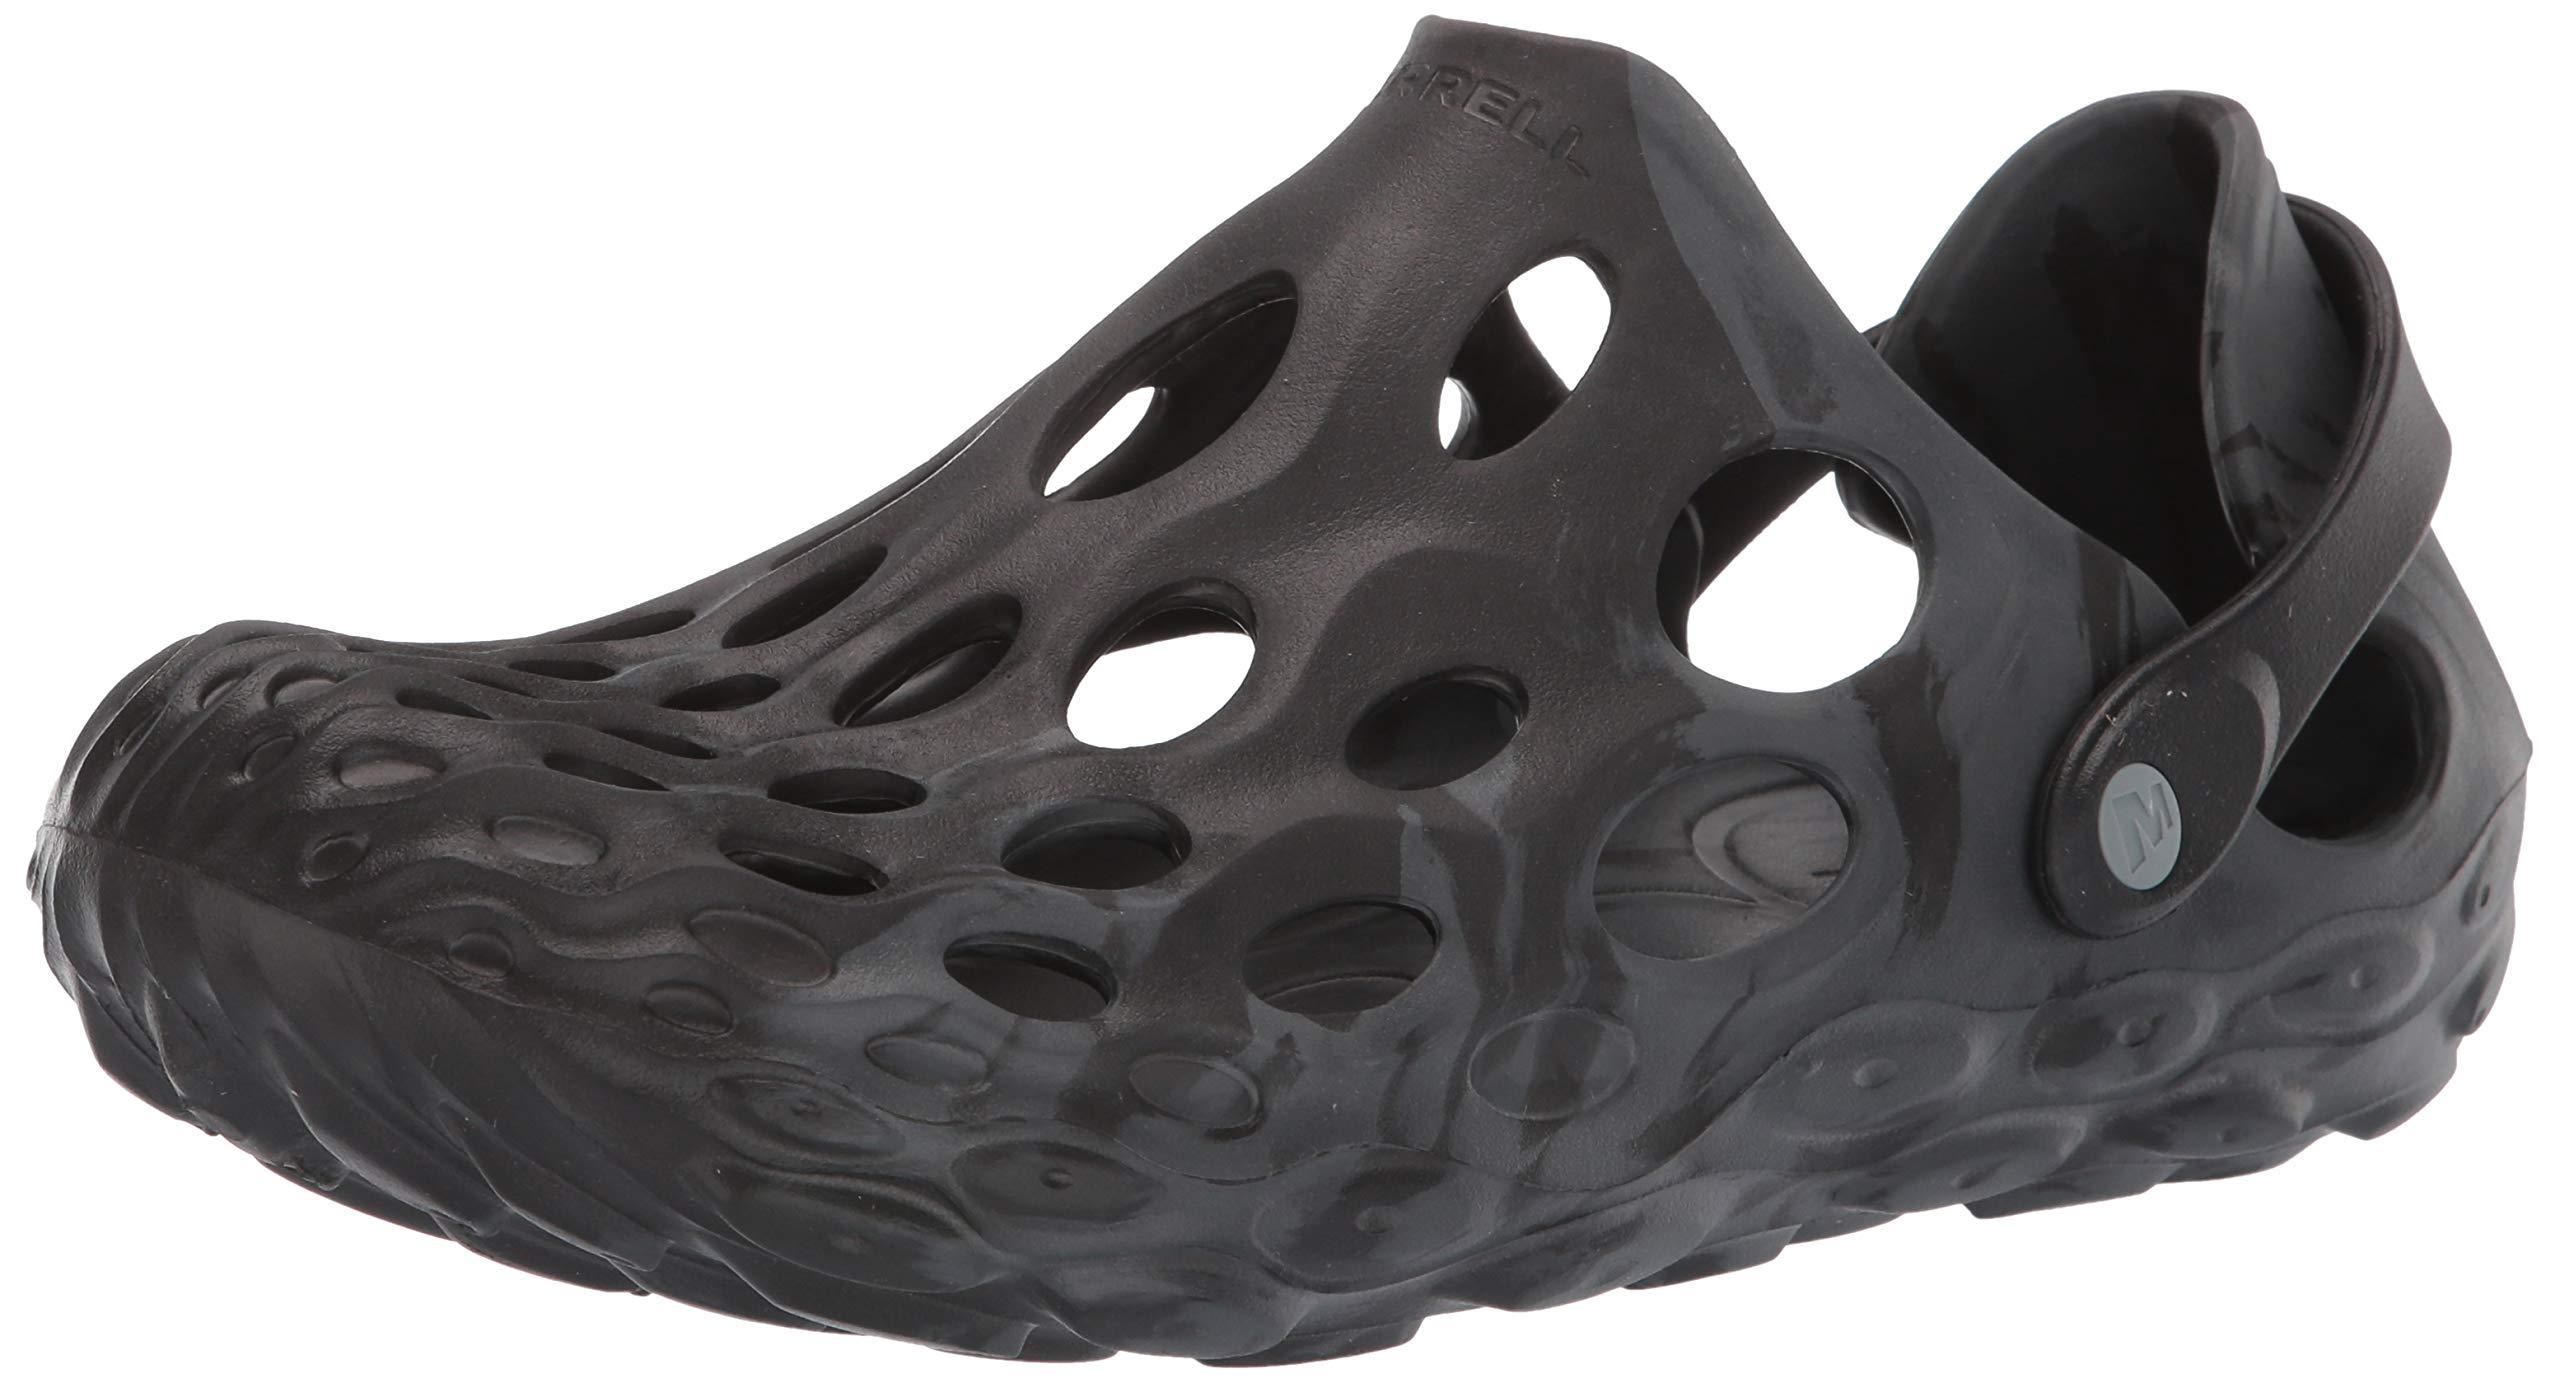 Merrell Men's Hydro MOC Water Shoe, Black, 10.0 M US